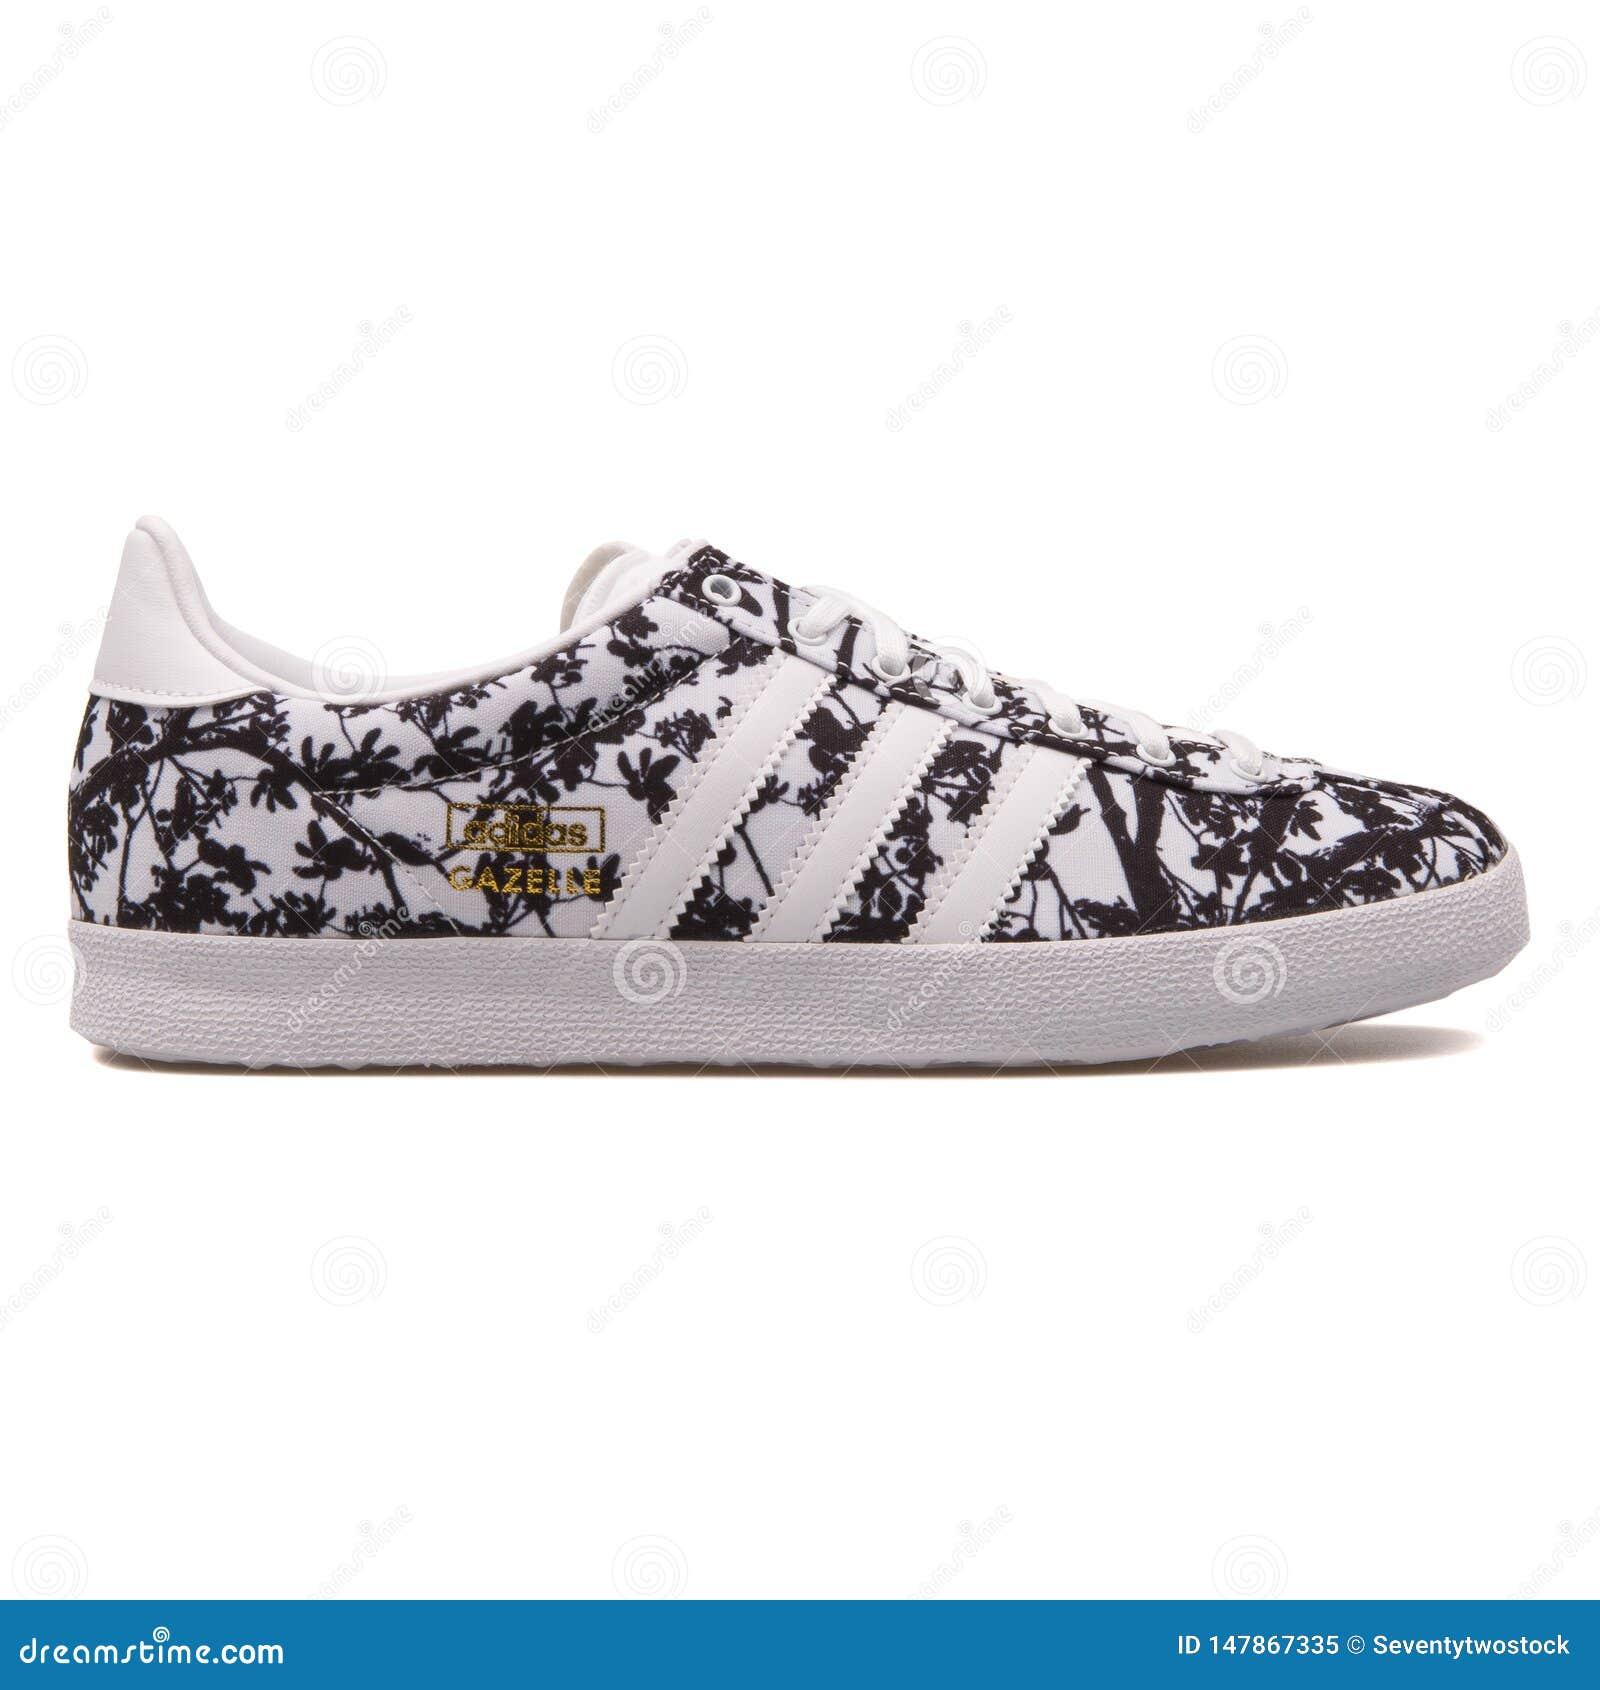 tono rotación matiz  Adidas Gazelle OG Floral Black And White Sneaker Editorial Image - Image of  sneakers, shoe: 147867335